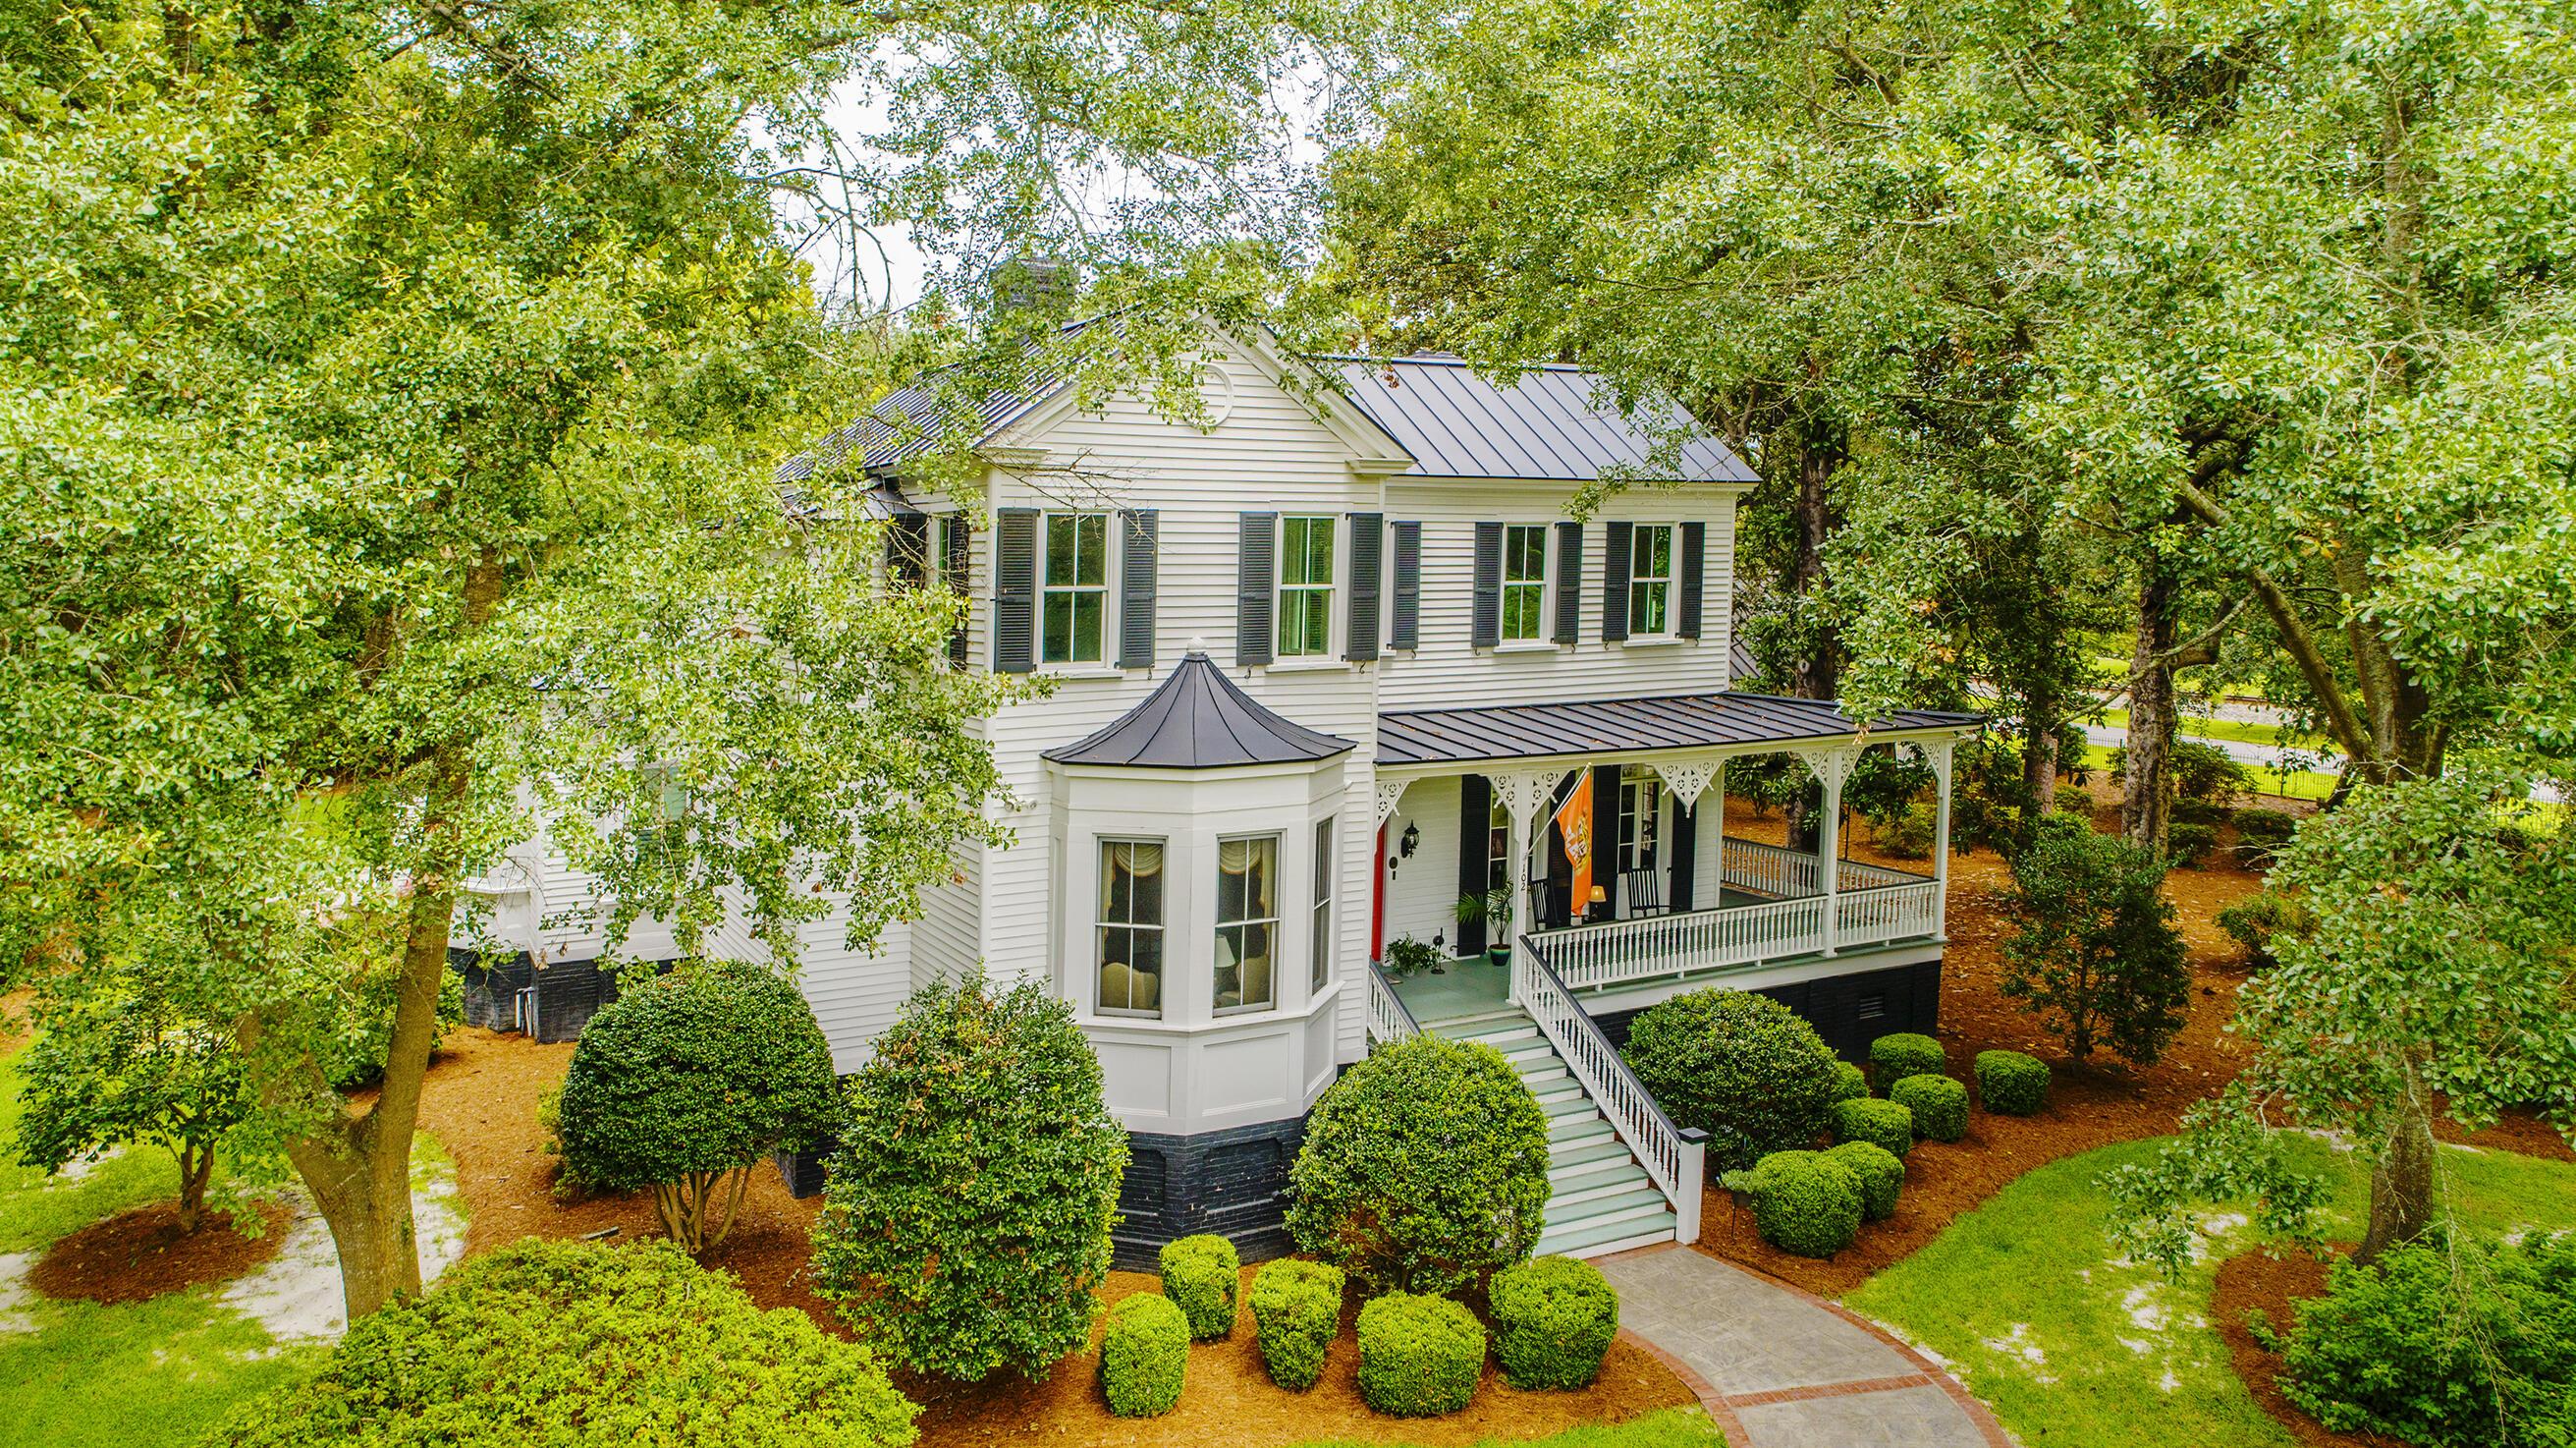 Summerville Homes For Sale - 102 Hickory, Summerville, SC - 32